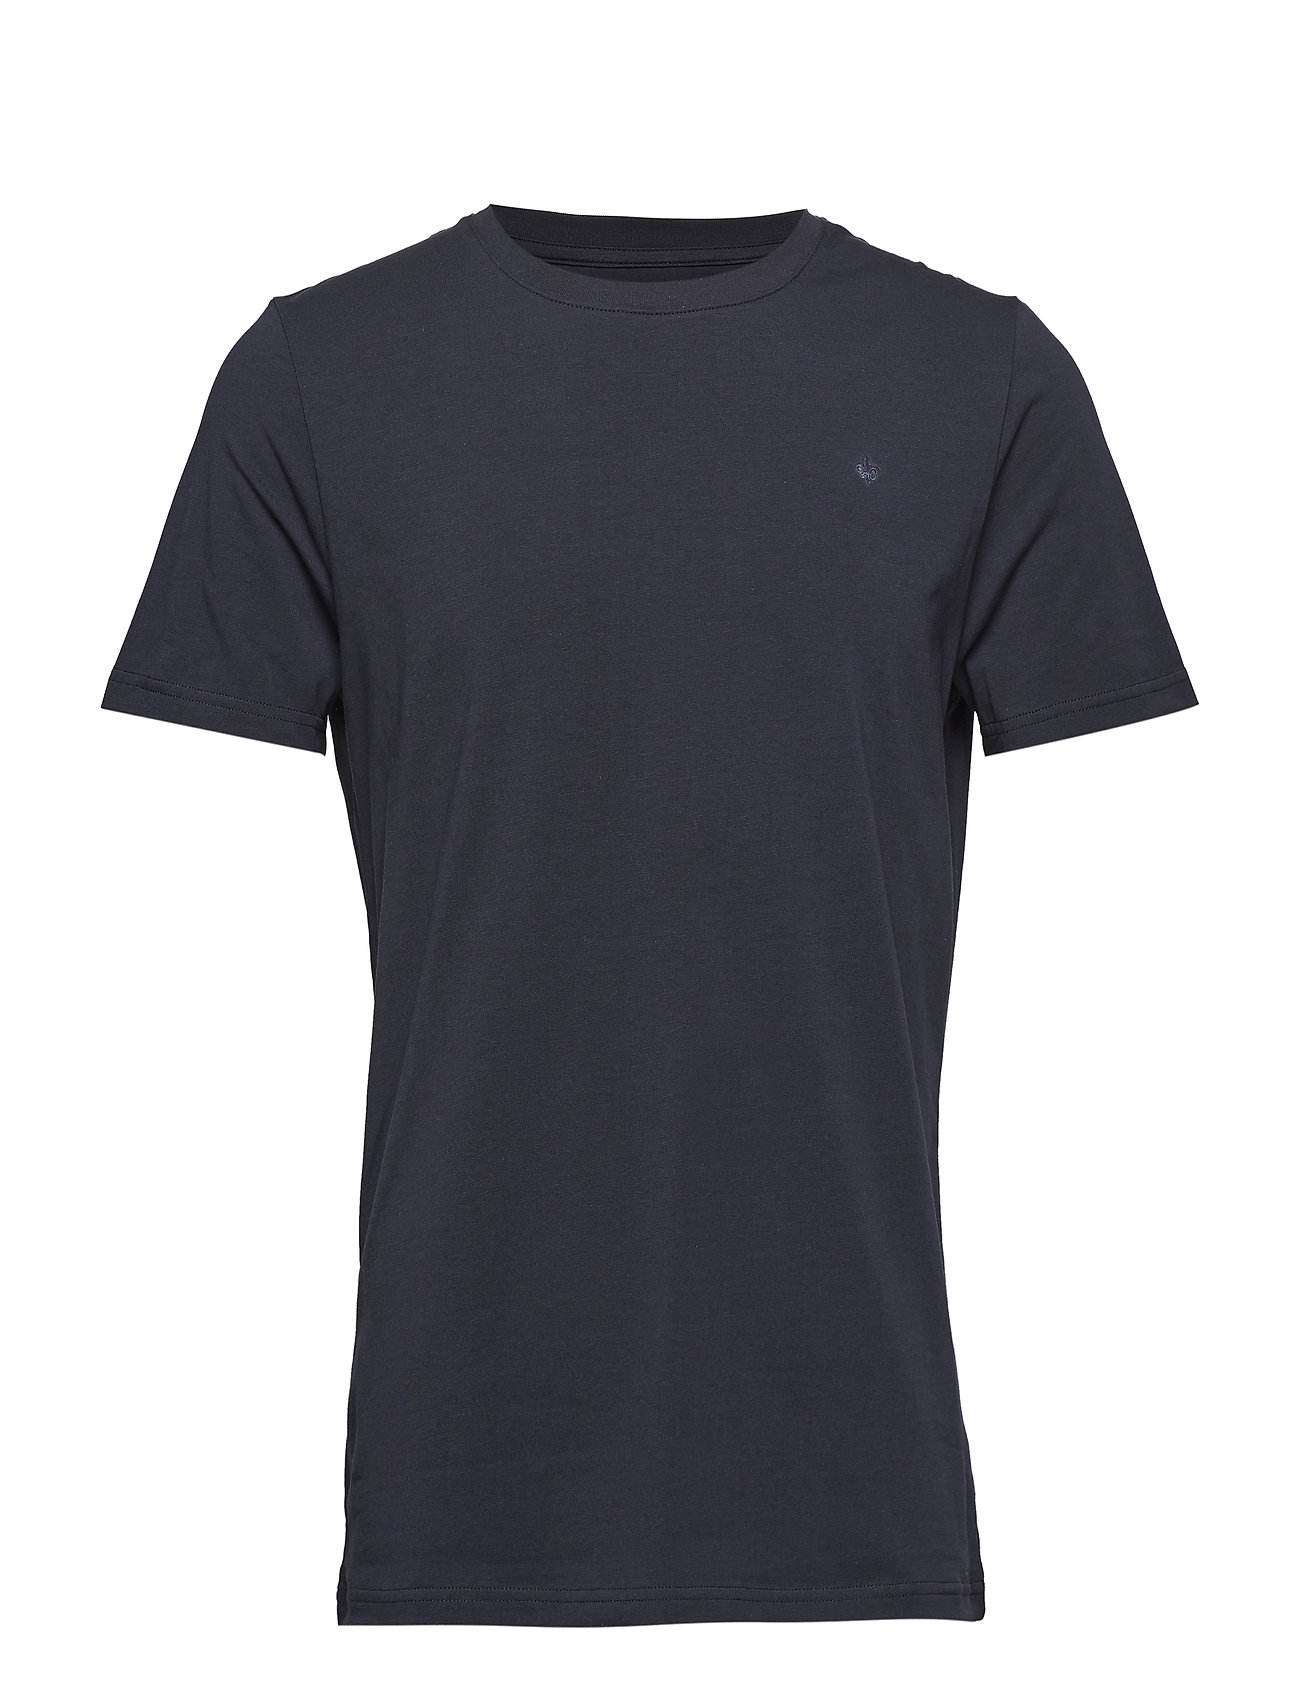 Image of James Tee T-shirt Blå Morris (3072438891)